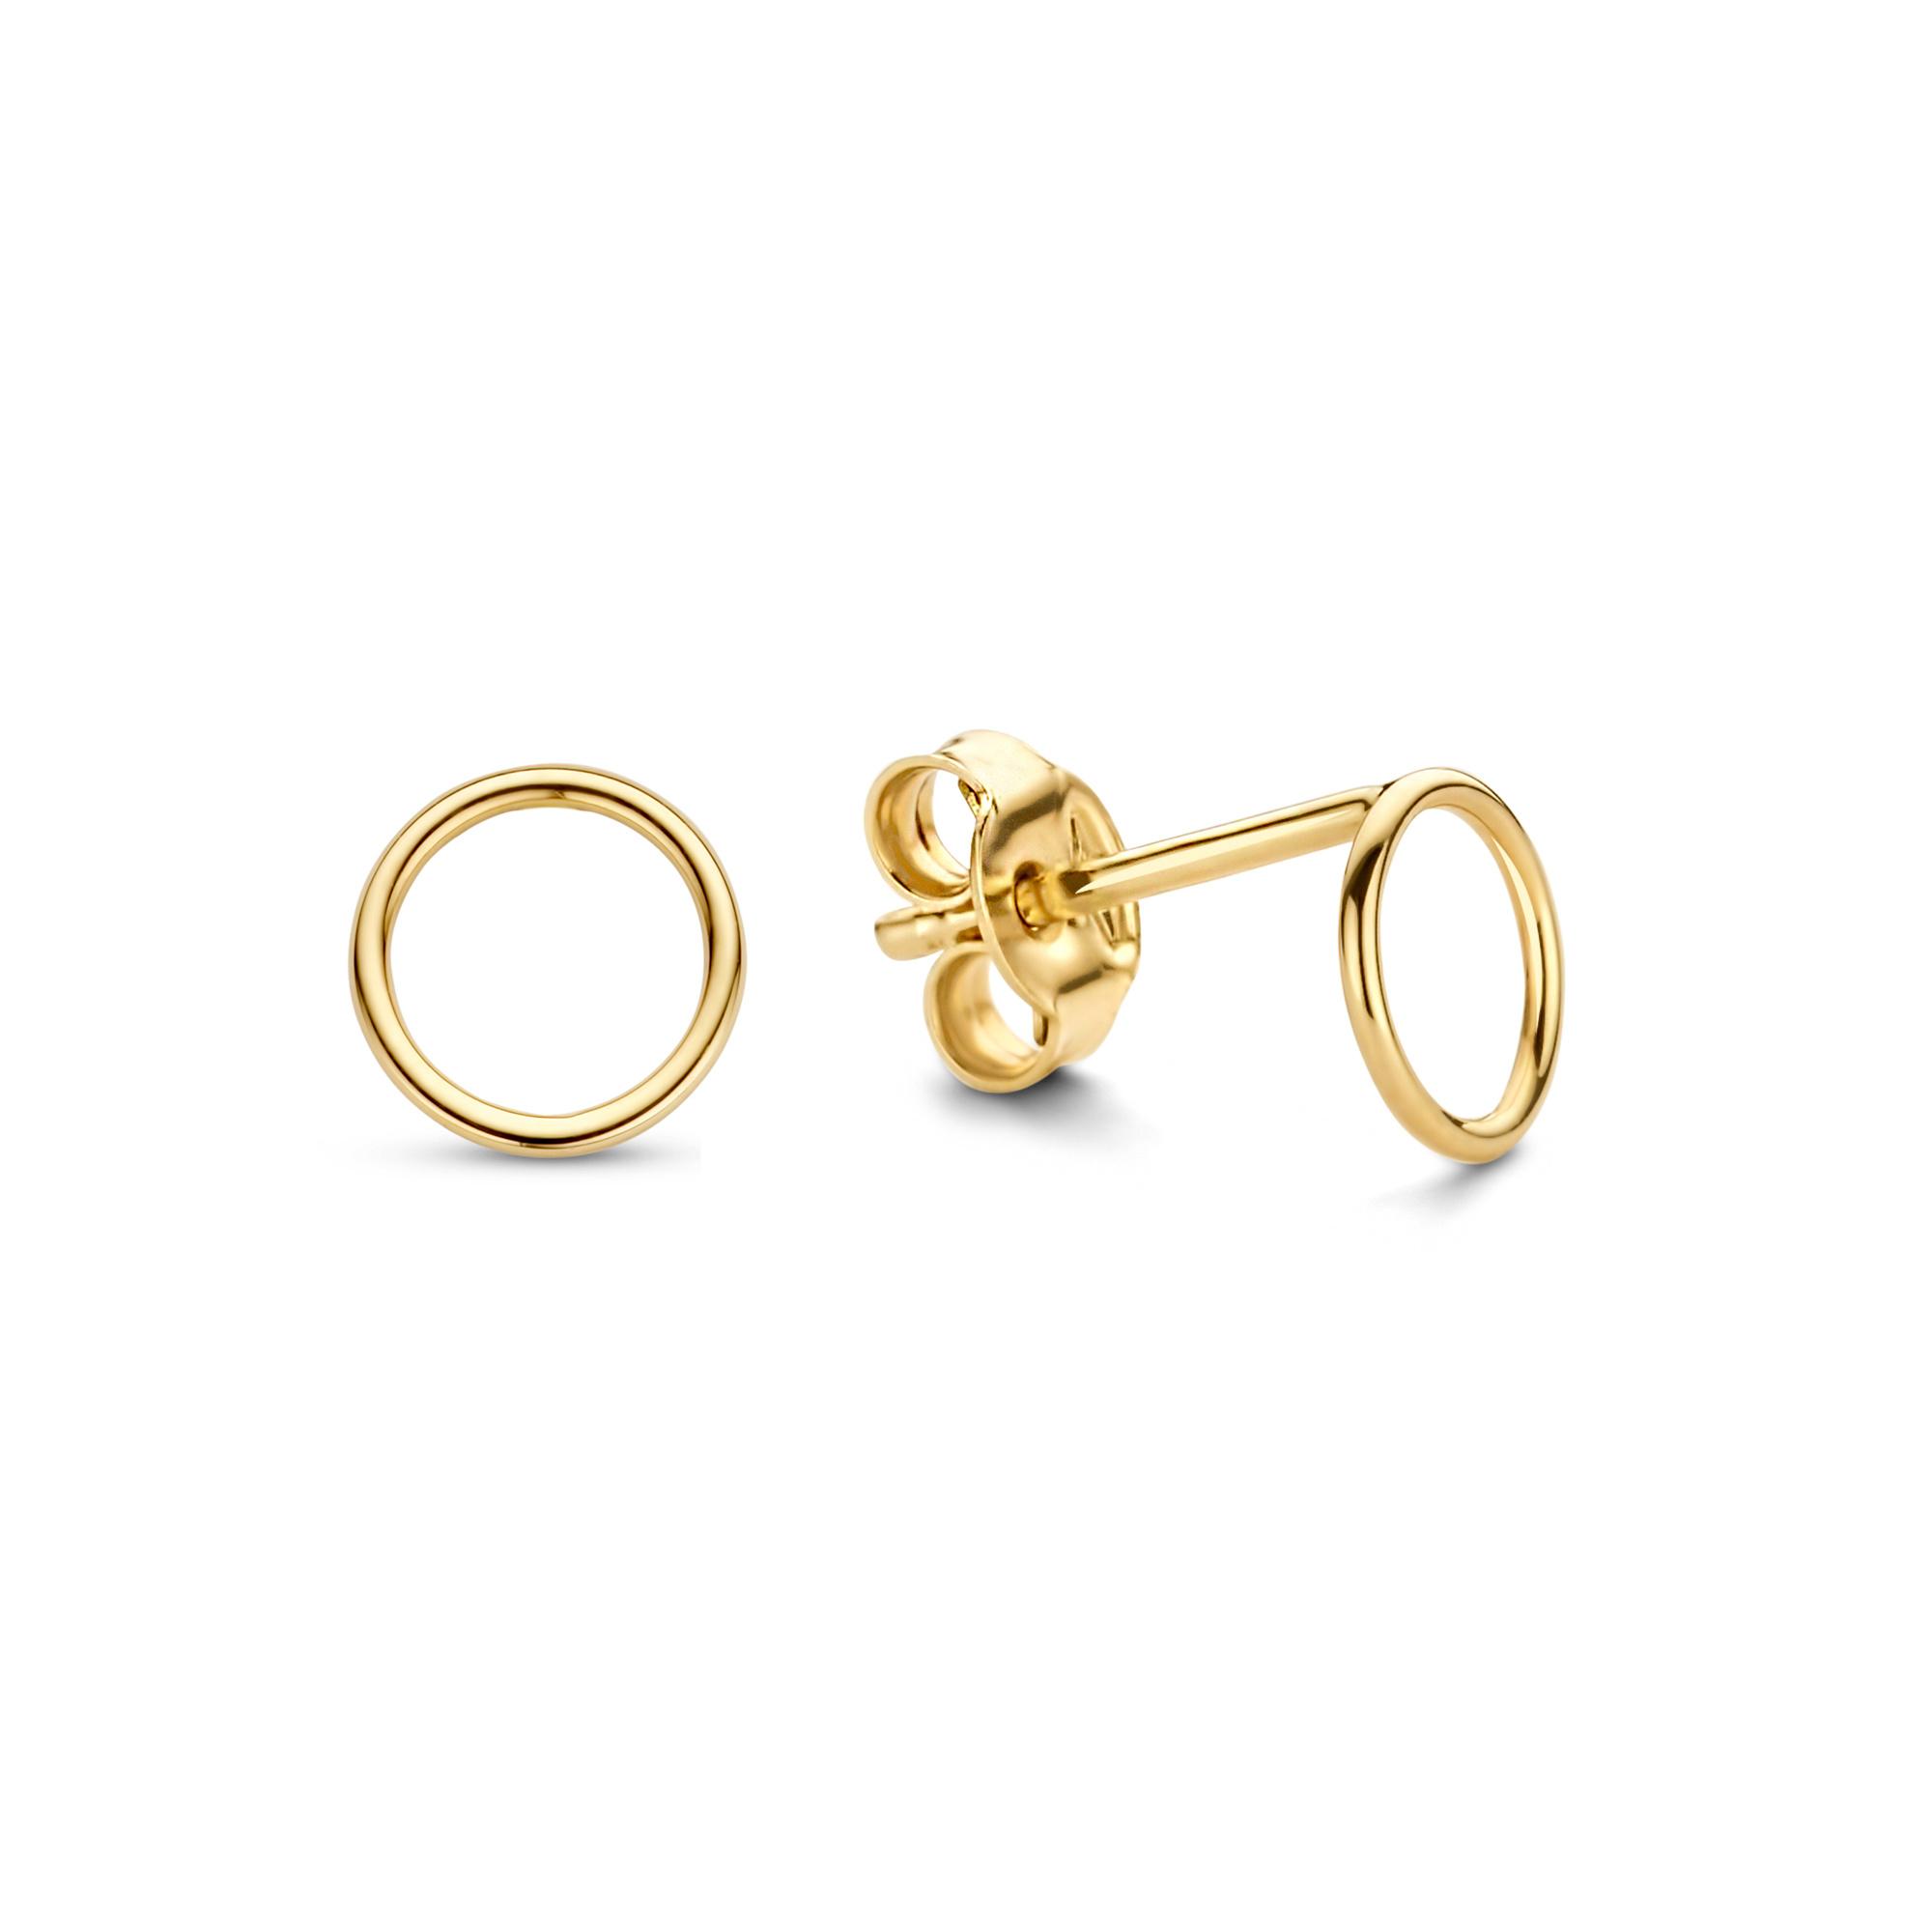 Isabel Bernard Belleville Anna 14 karaat gouden oorknoppen